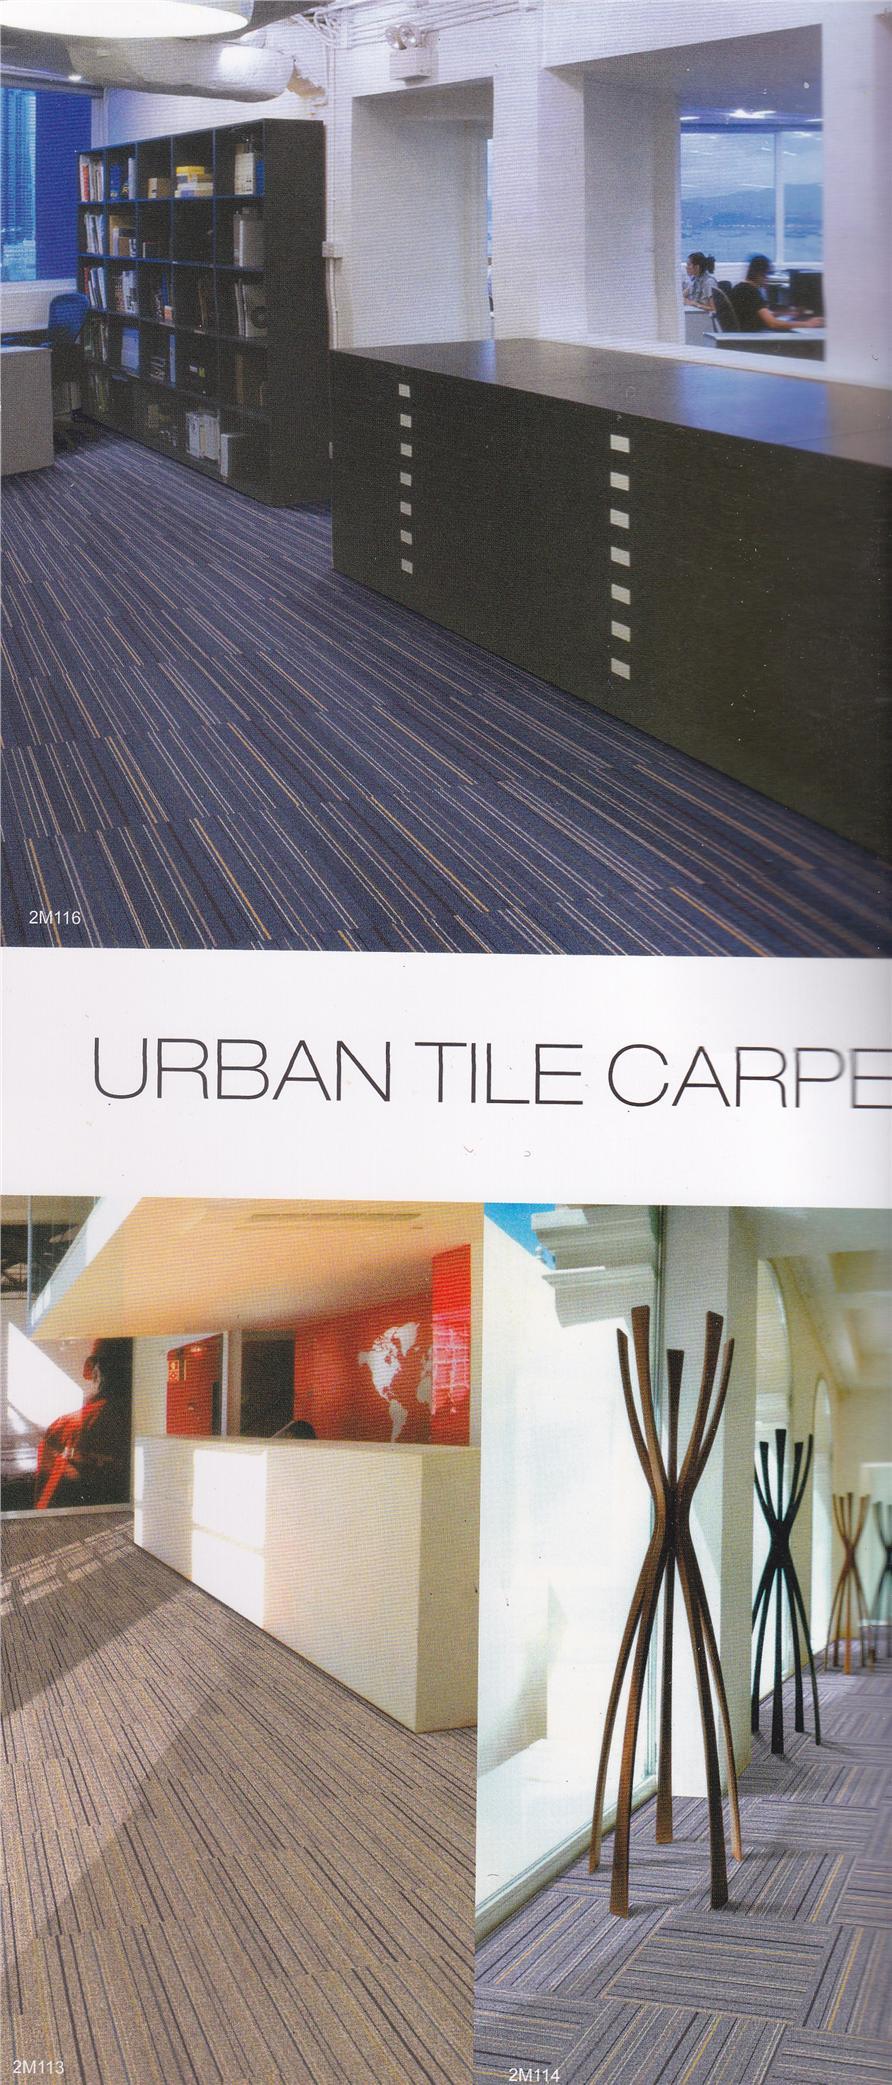 Carpet Tile Supply Amp Installation End 7 15 2019 12 25 Pm